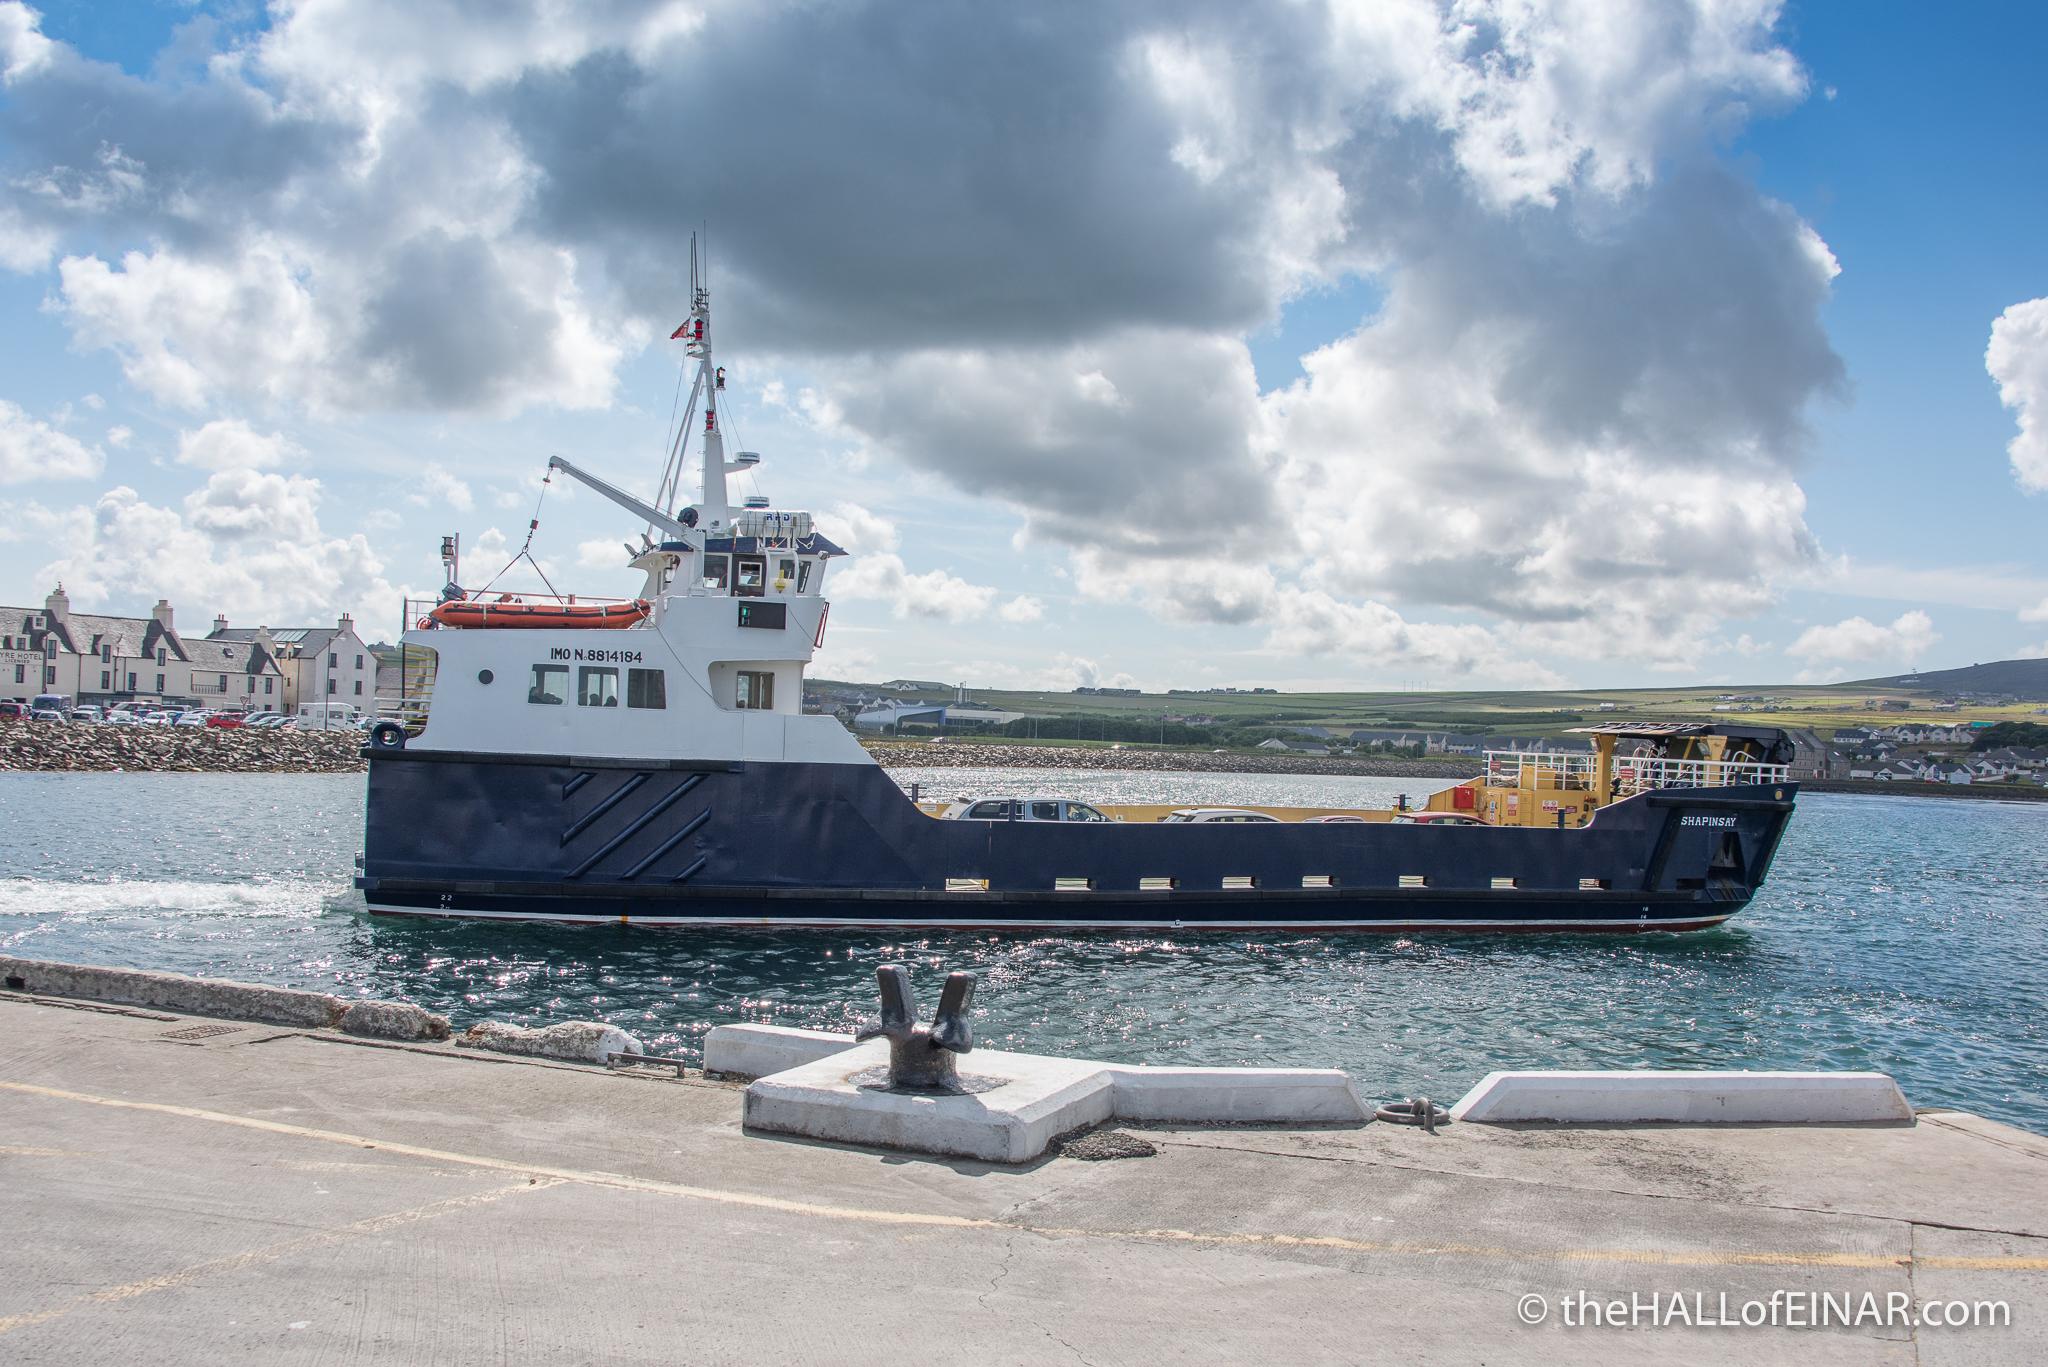 Shapinsay Ferry - The Hall of Einar - photograph (c) David Bailey (not the)